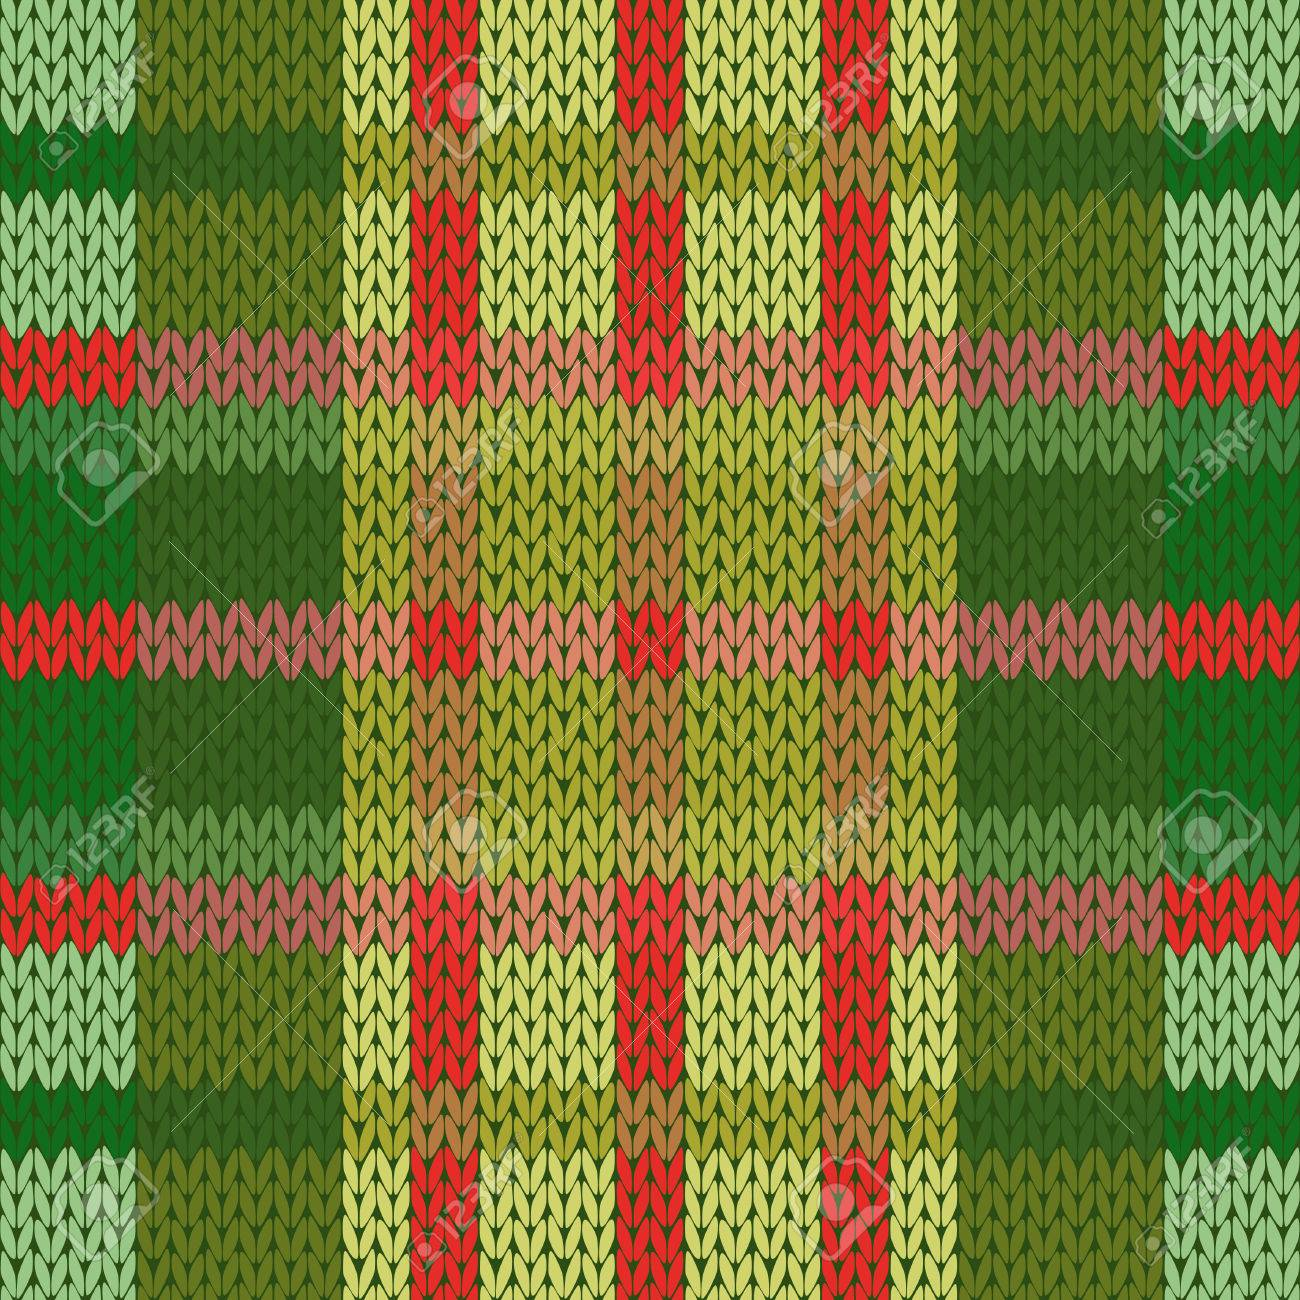 Seamless Vector Pattern As A Woollen Celtic Tartan Plaid Or A